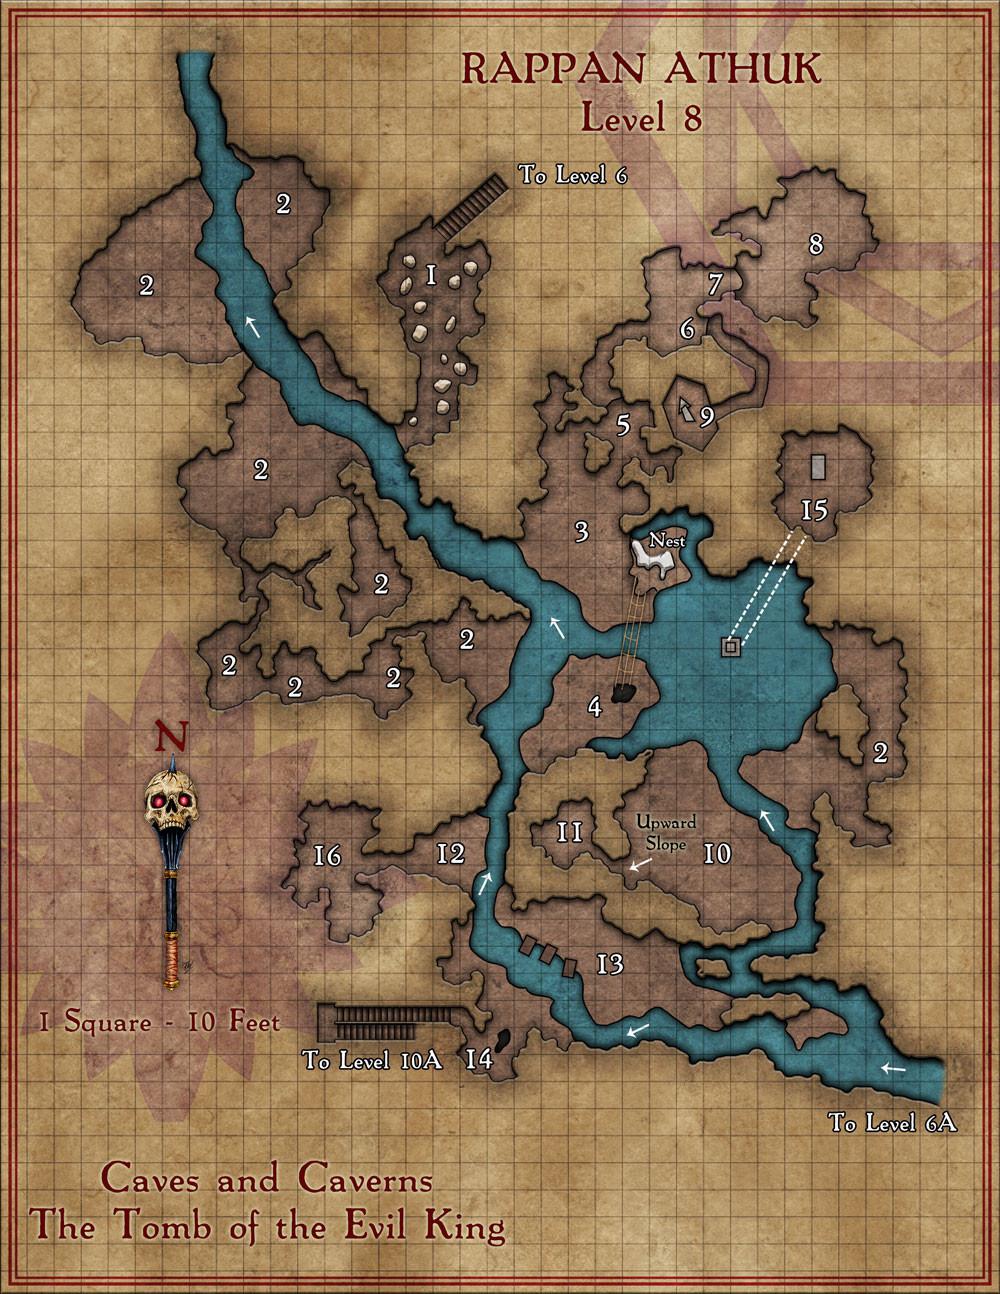 Rappan Athuk Map